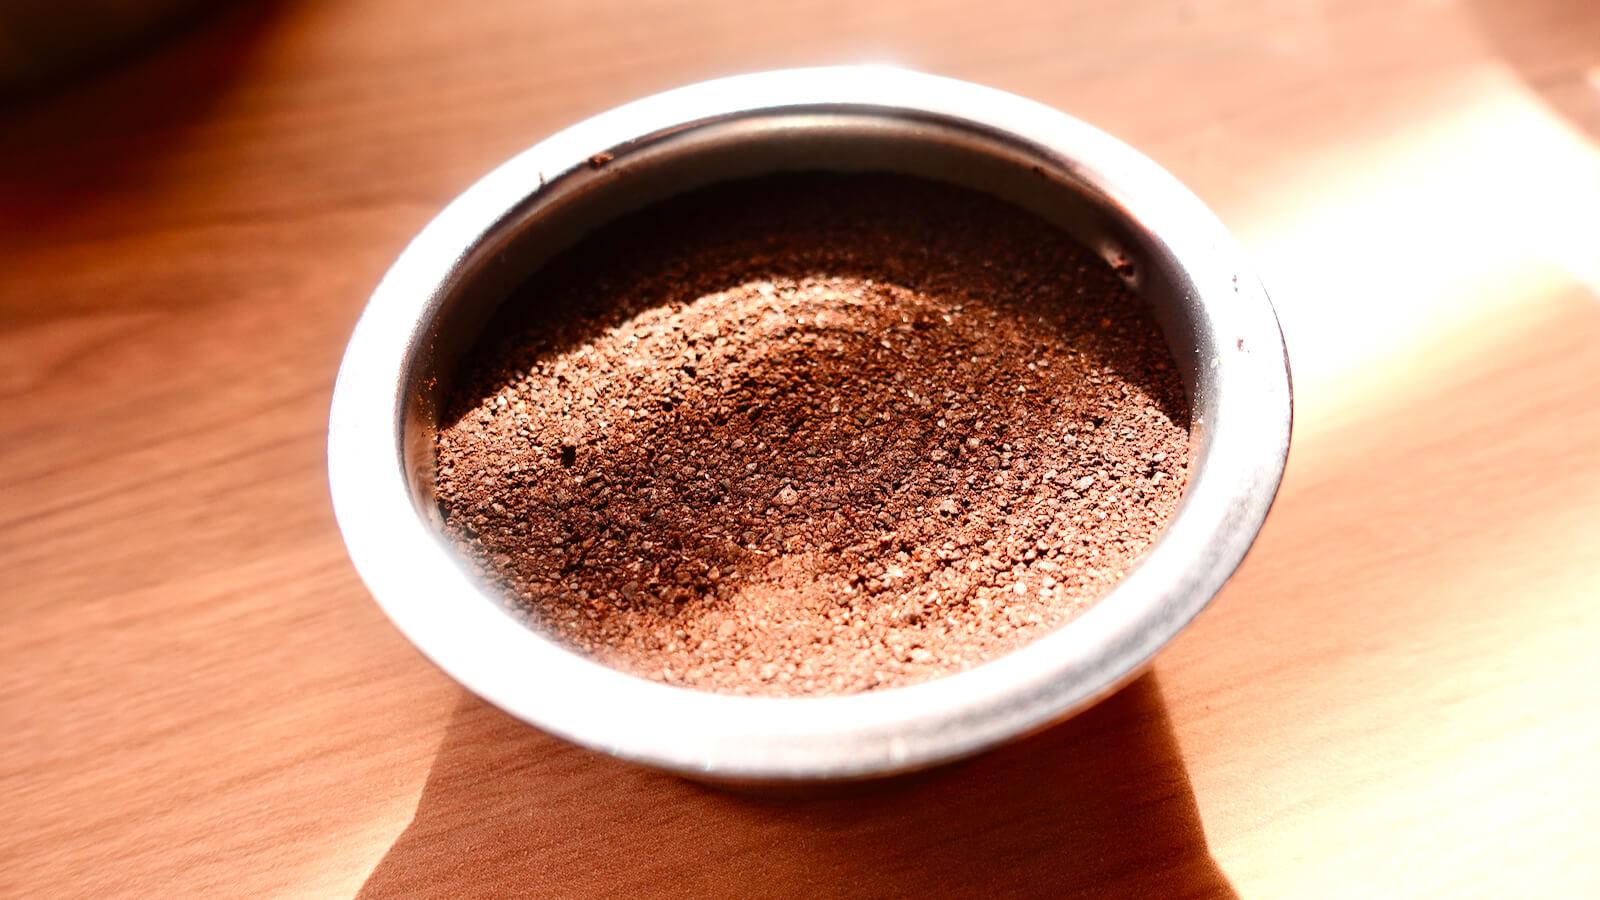 Delonghi espresso filter after tamping